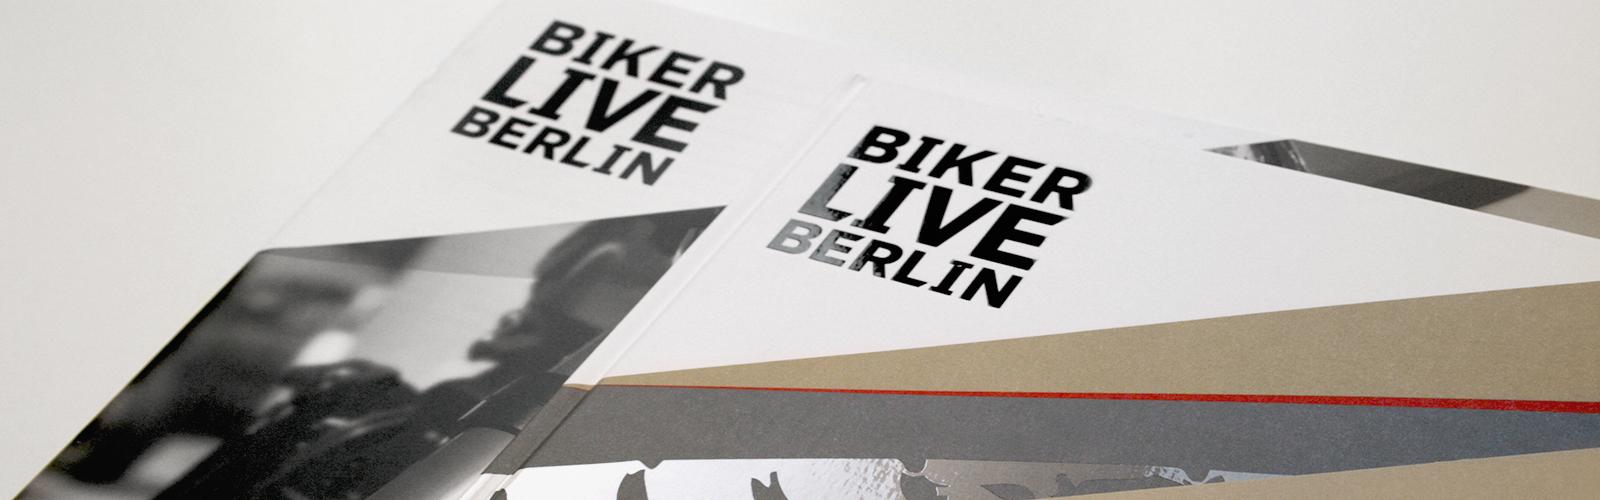 Braunwagner Communication Design ABB Tilke Biker Live Berlin Editorial & Corporate Design 2011